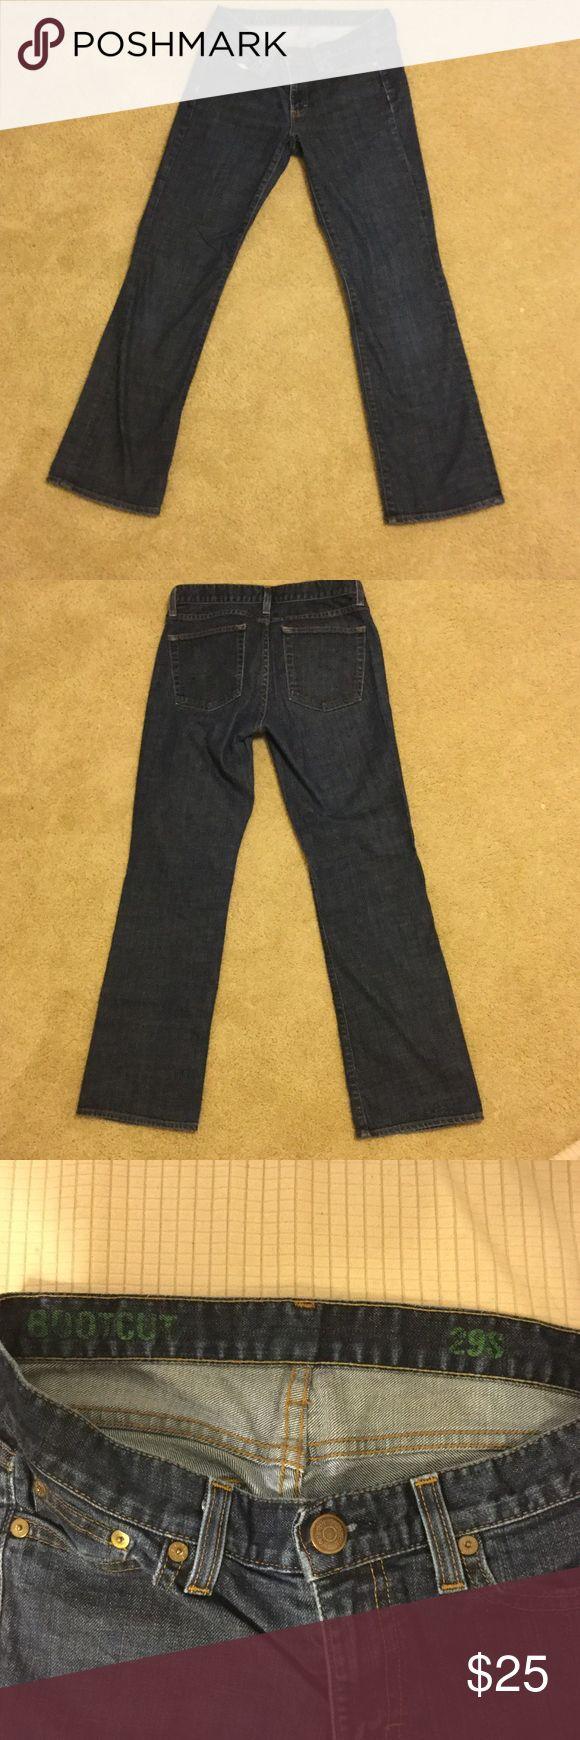 J Crew Bootcut Jeans Perfect condition J Crew bootcut size 29S jeans 98% cotton 2% elastane. Th we aeis great jeans in perfect condition coloring is a nice dark blue J. Crew Jeans Boot Cut